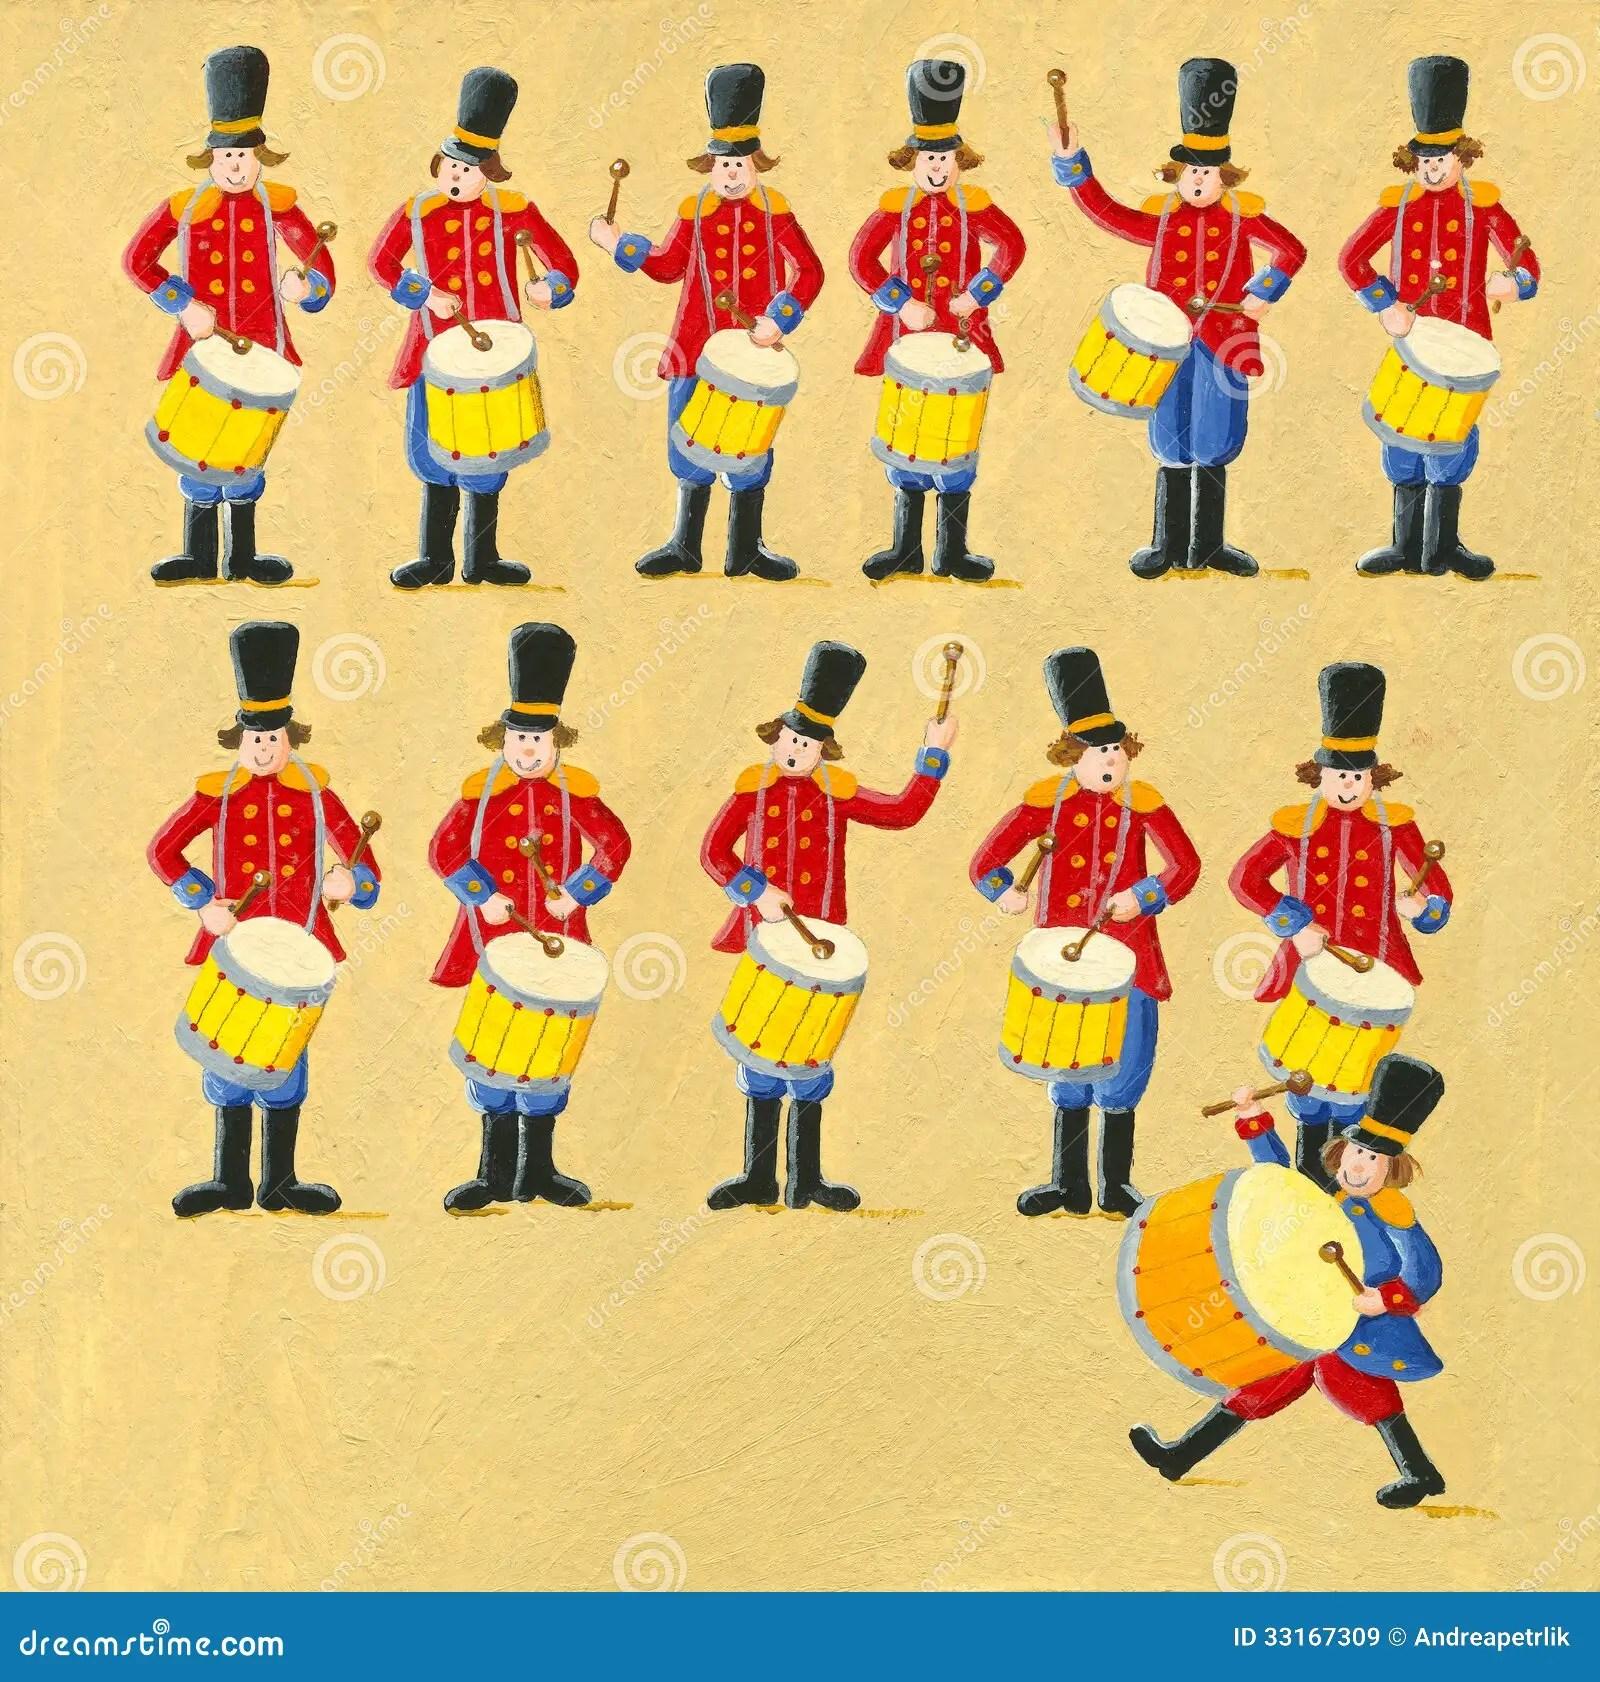 hight resolution of twelve drummers drumming